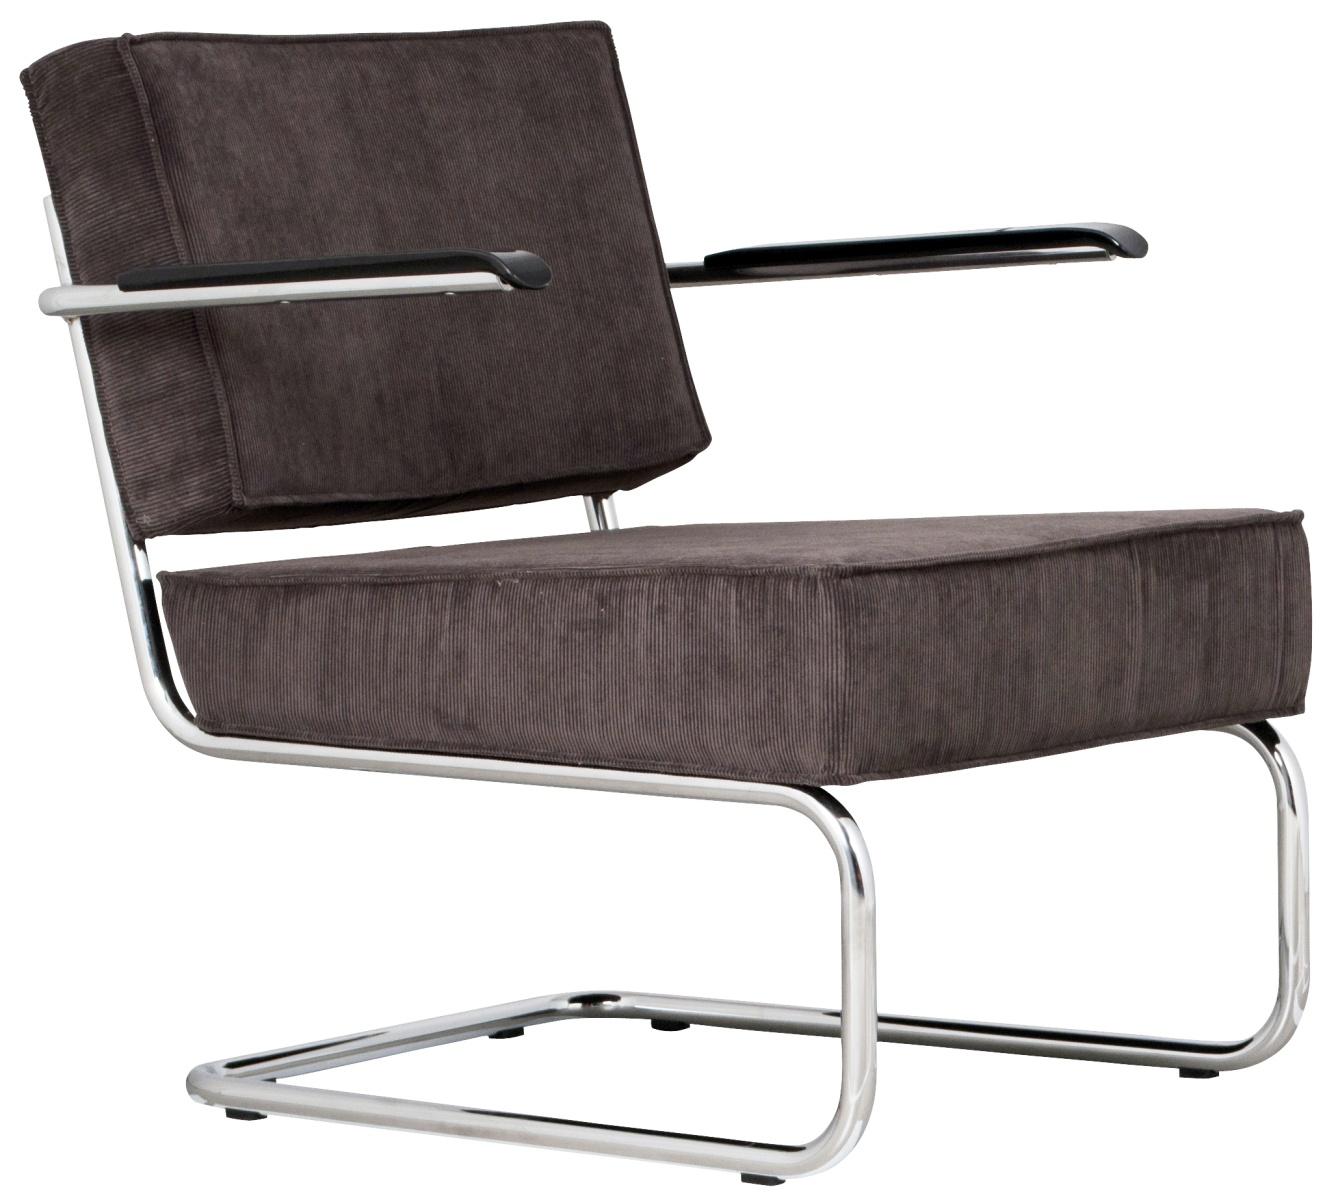 Zuiver lounge chair ridge rib fauteuil zuiver in de aanbieding kopen - Lounge grijs ...